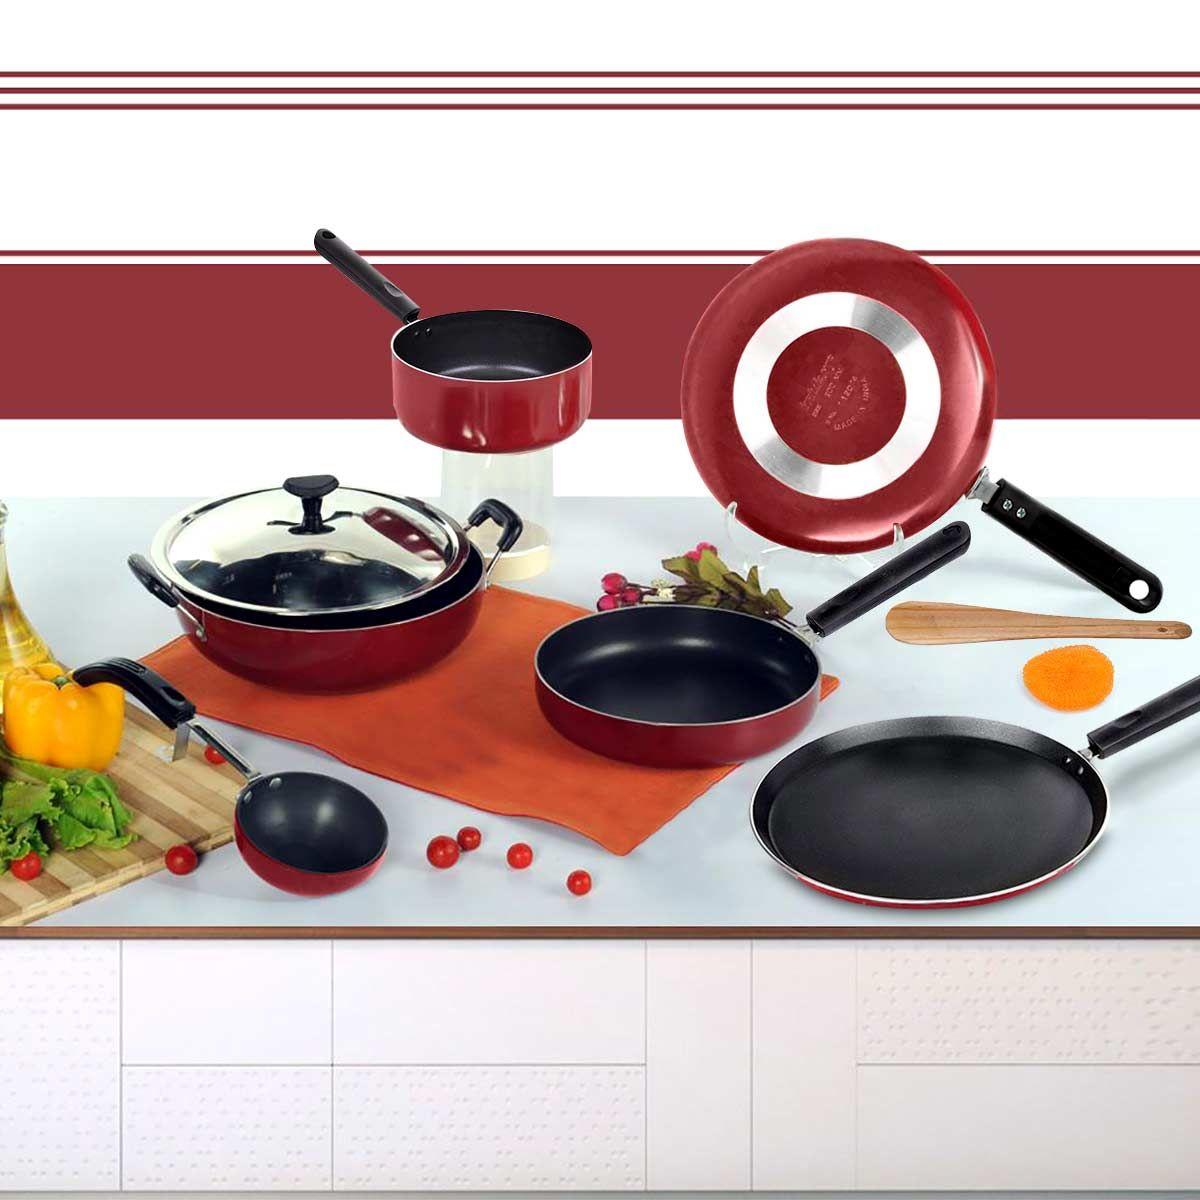 Buy brilliant 7pcs nonstick cookware set online at best for Kitchen set naaptol